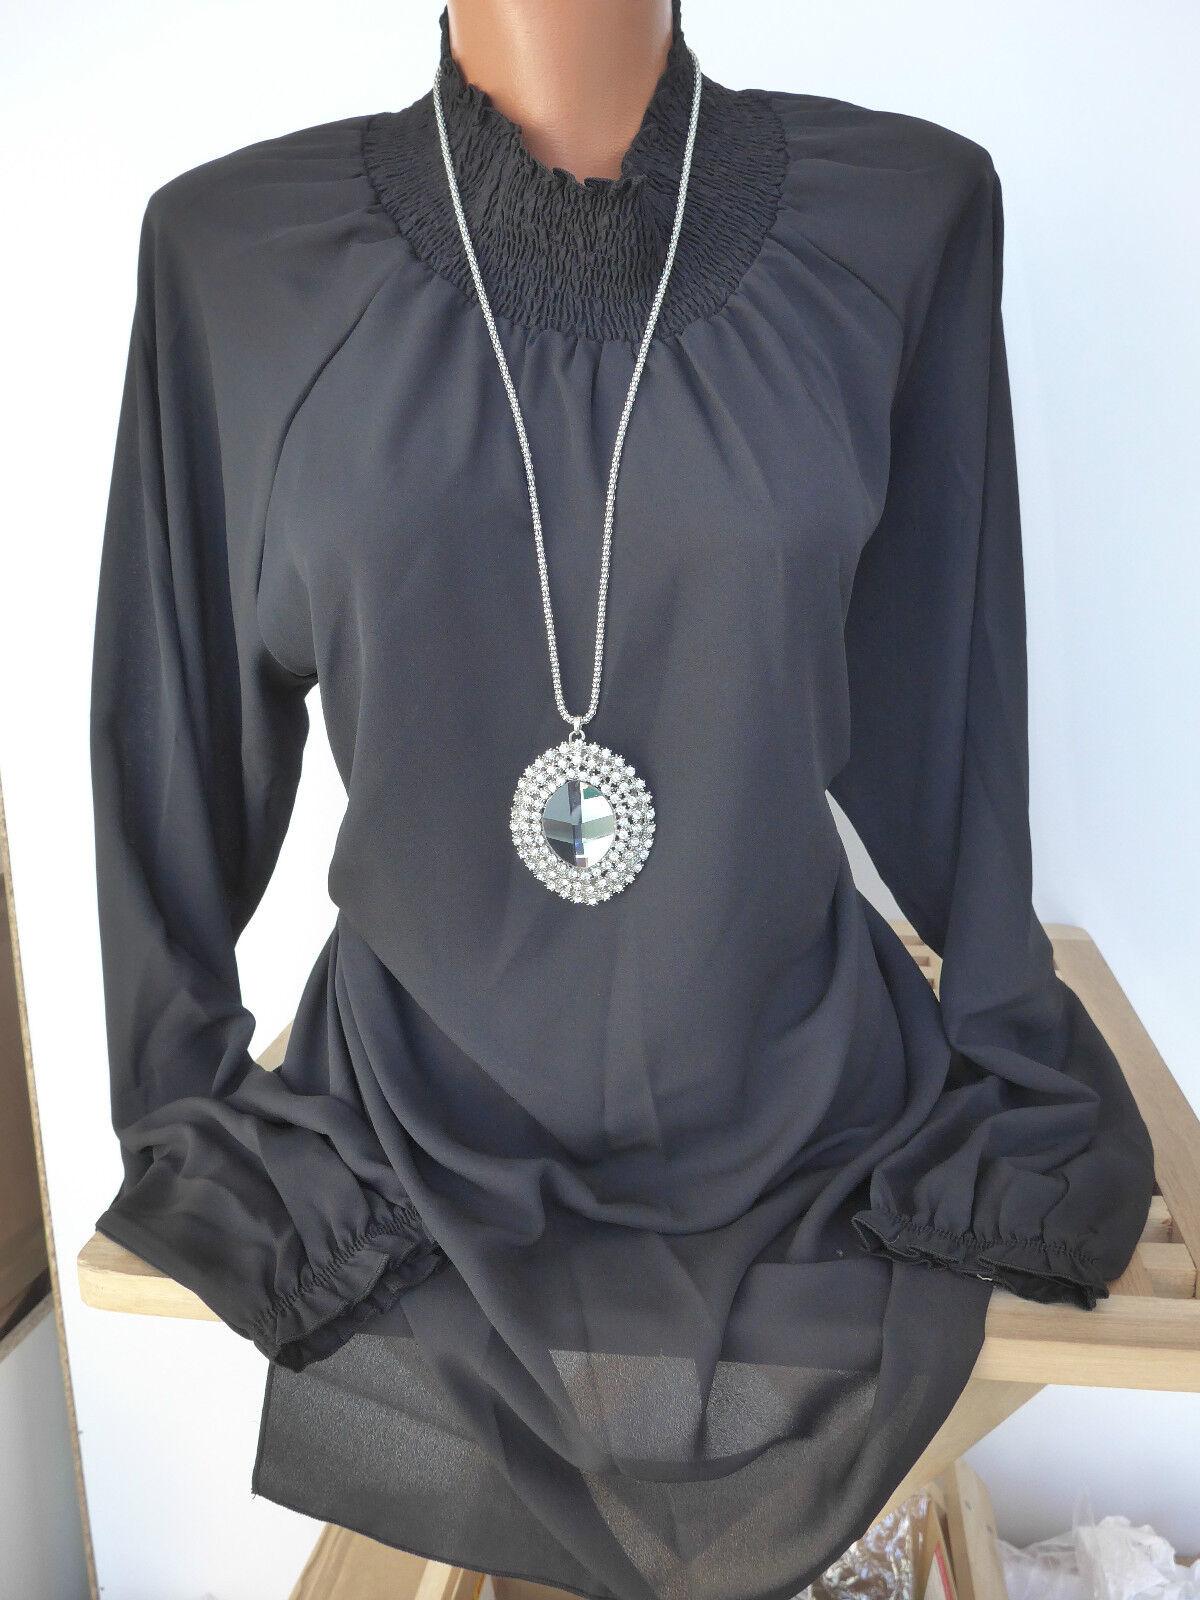 Sheego Tunika Bluse Shirt Gr. 44 - 52 Schwarz mit hohem Kragen (715) NEU